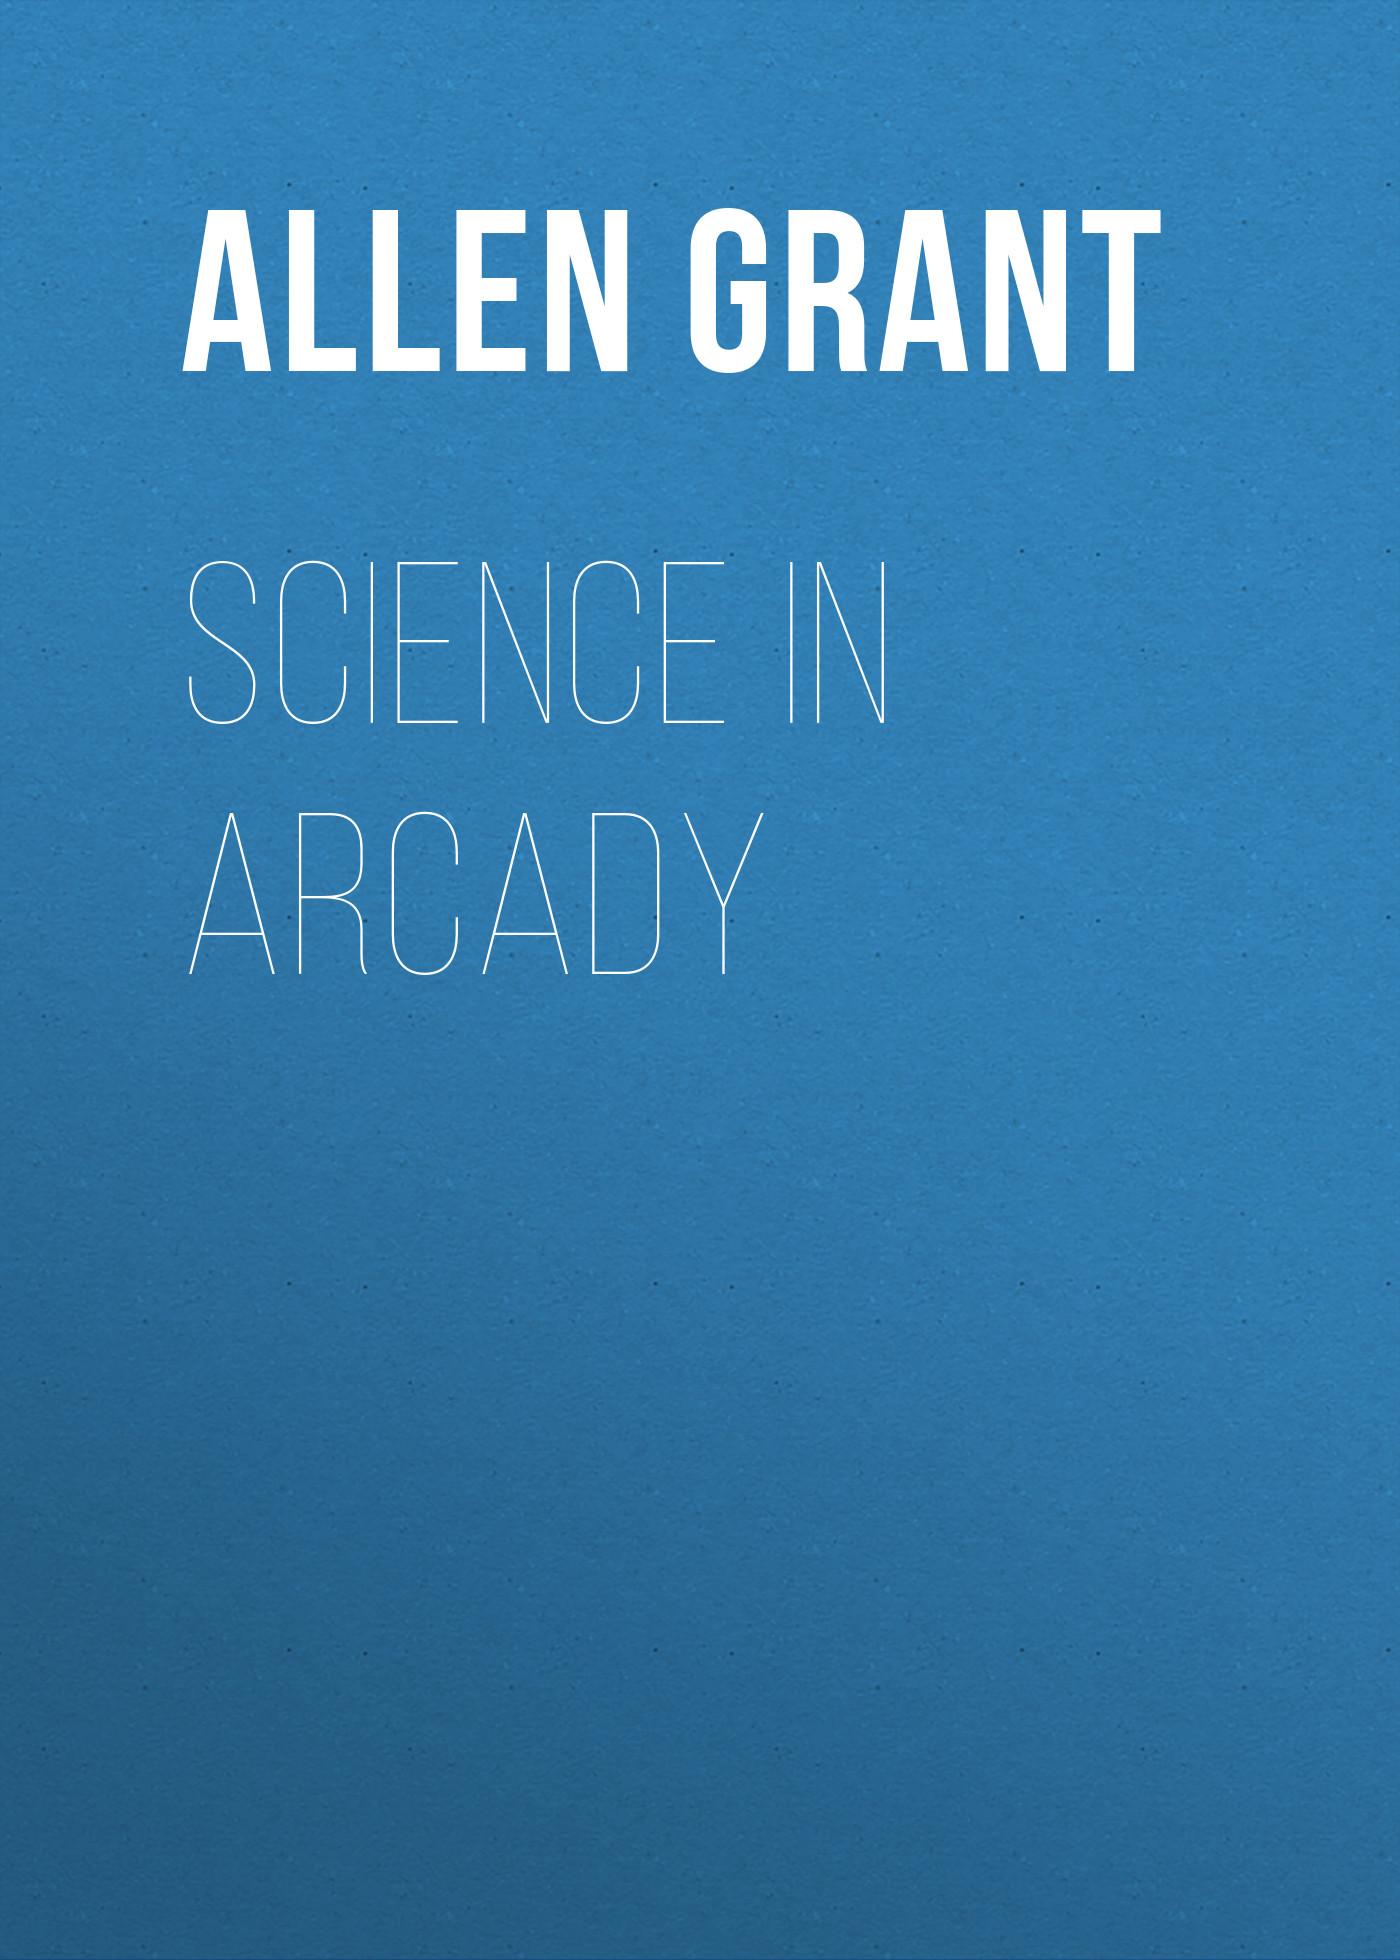 Allen Grant Science in Arcady недорого